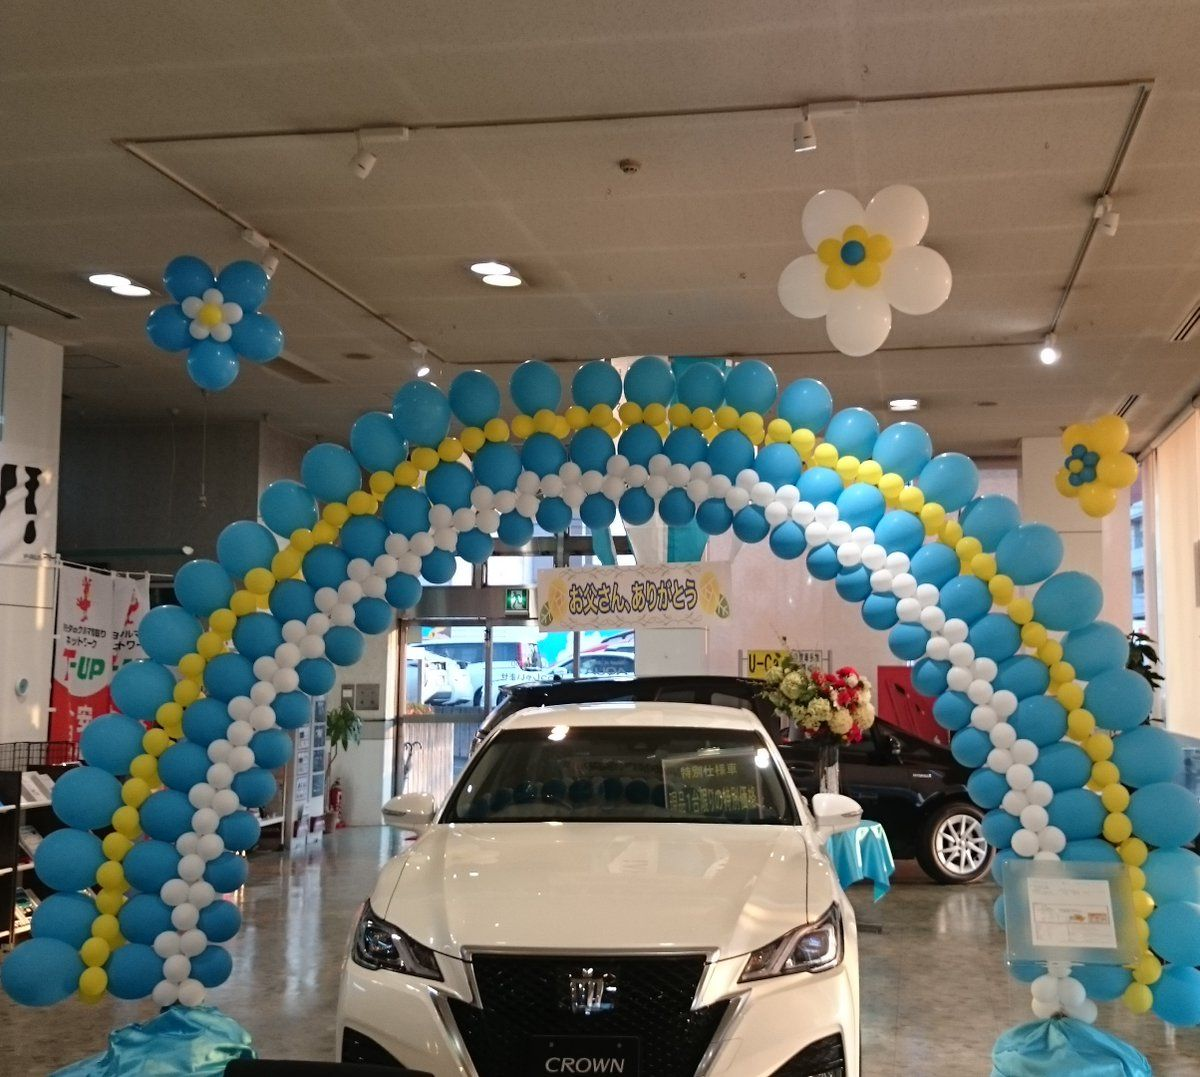 Wedding vehicle decorations  ナランハ バルーンカンパニーnaranjaballoonさん  Twitter